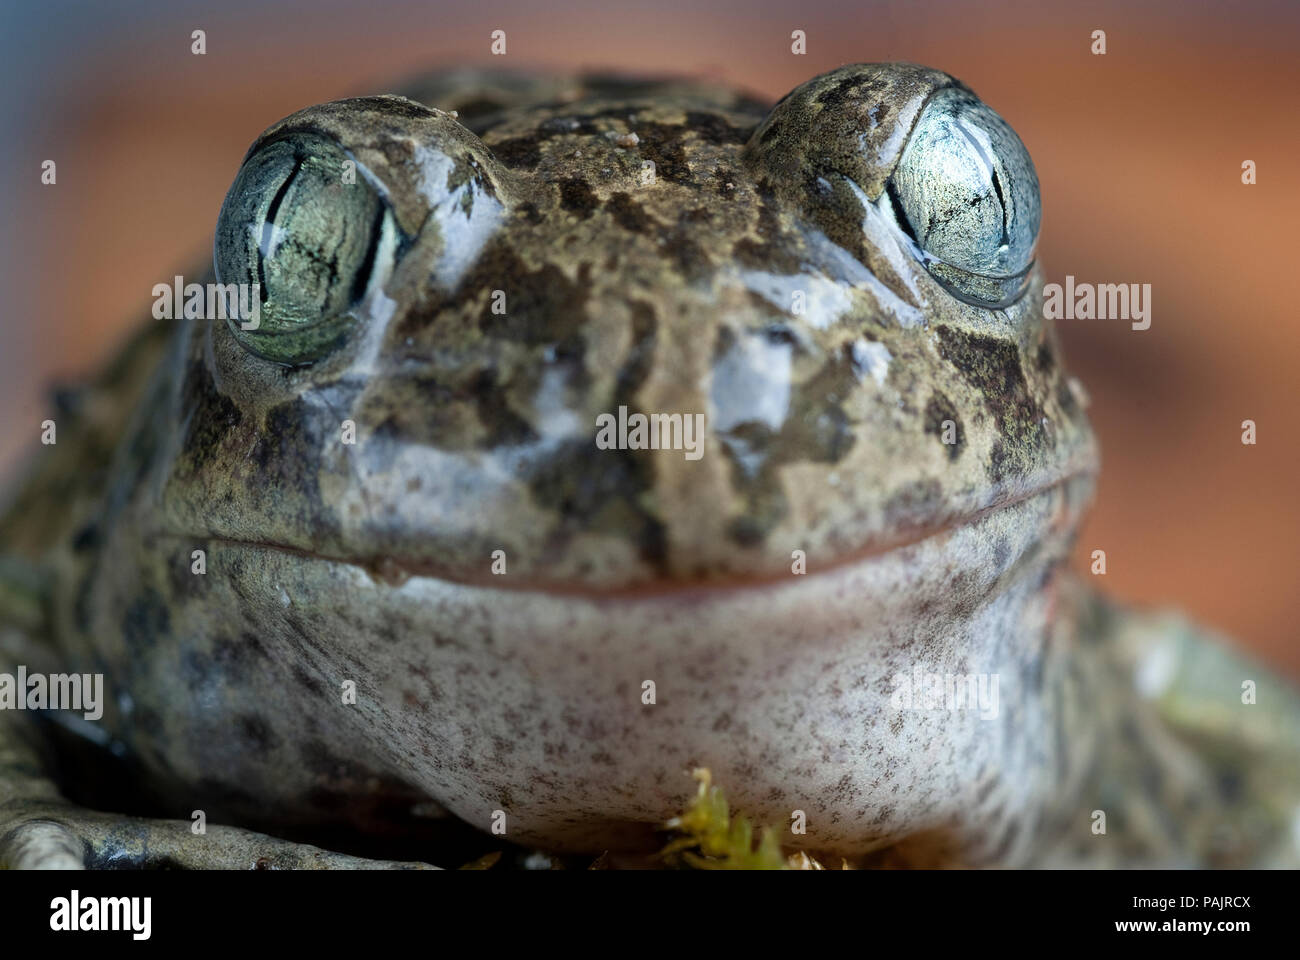 Spadefoot toad, Pelobates cultripes, amphibian - Stock Image